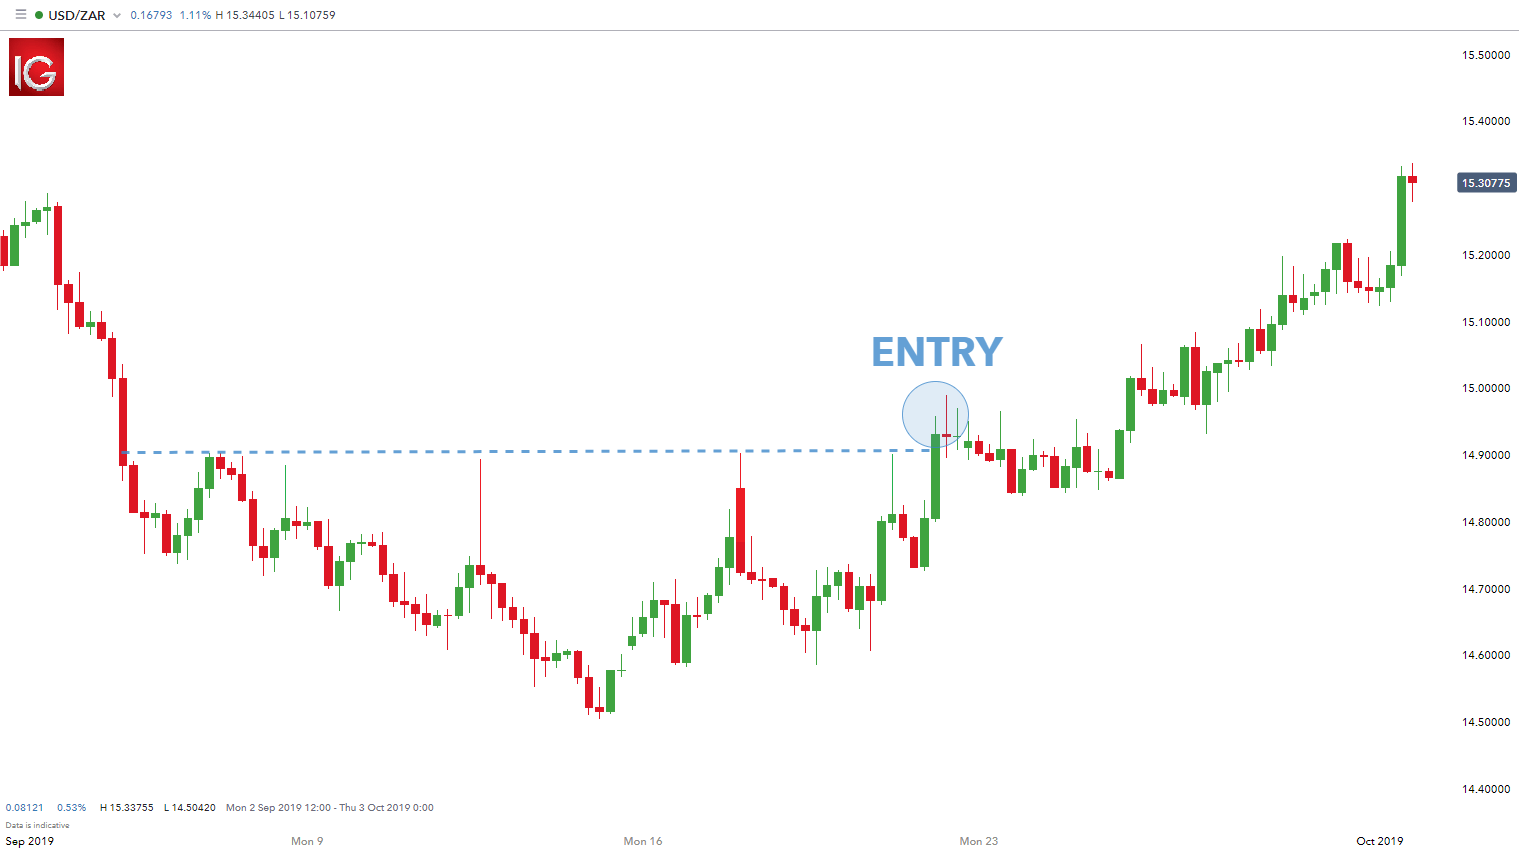 Forex trading time frames